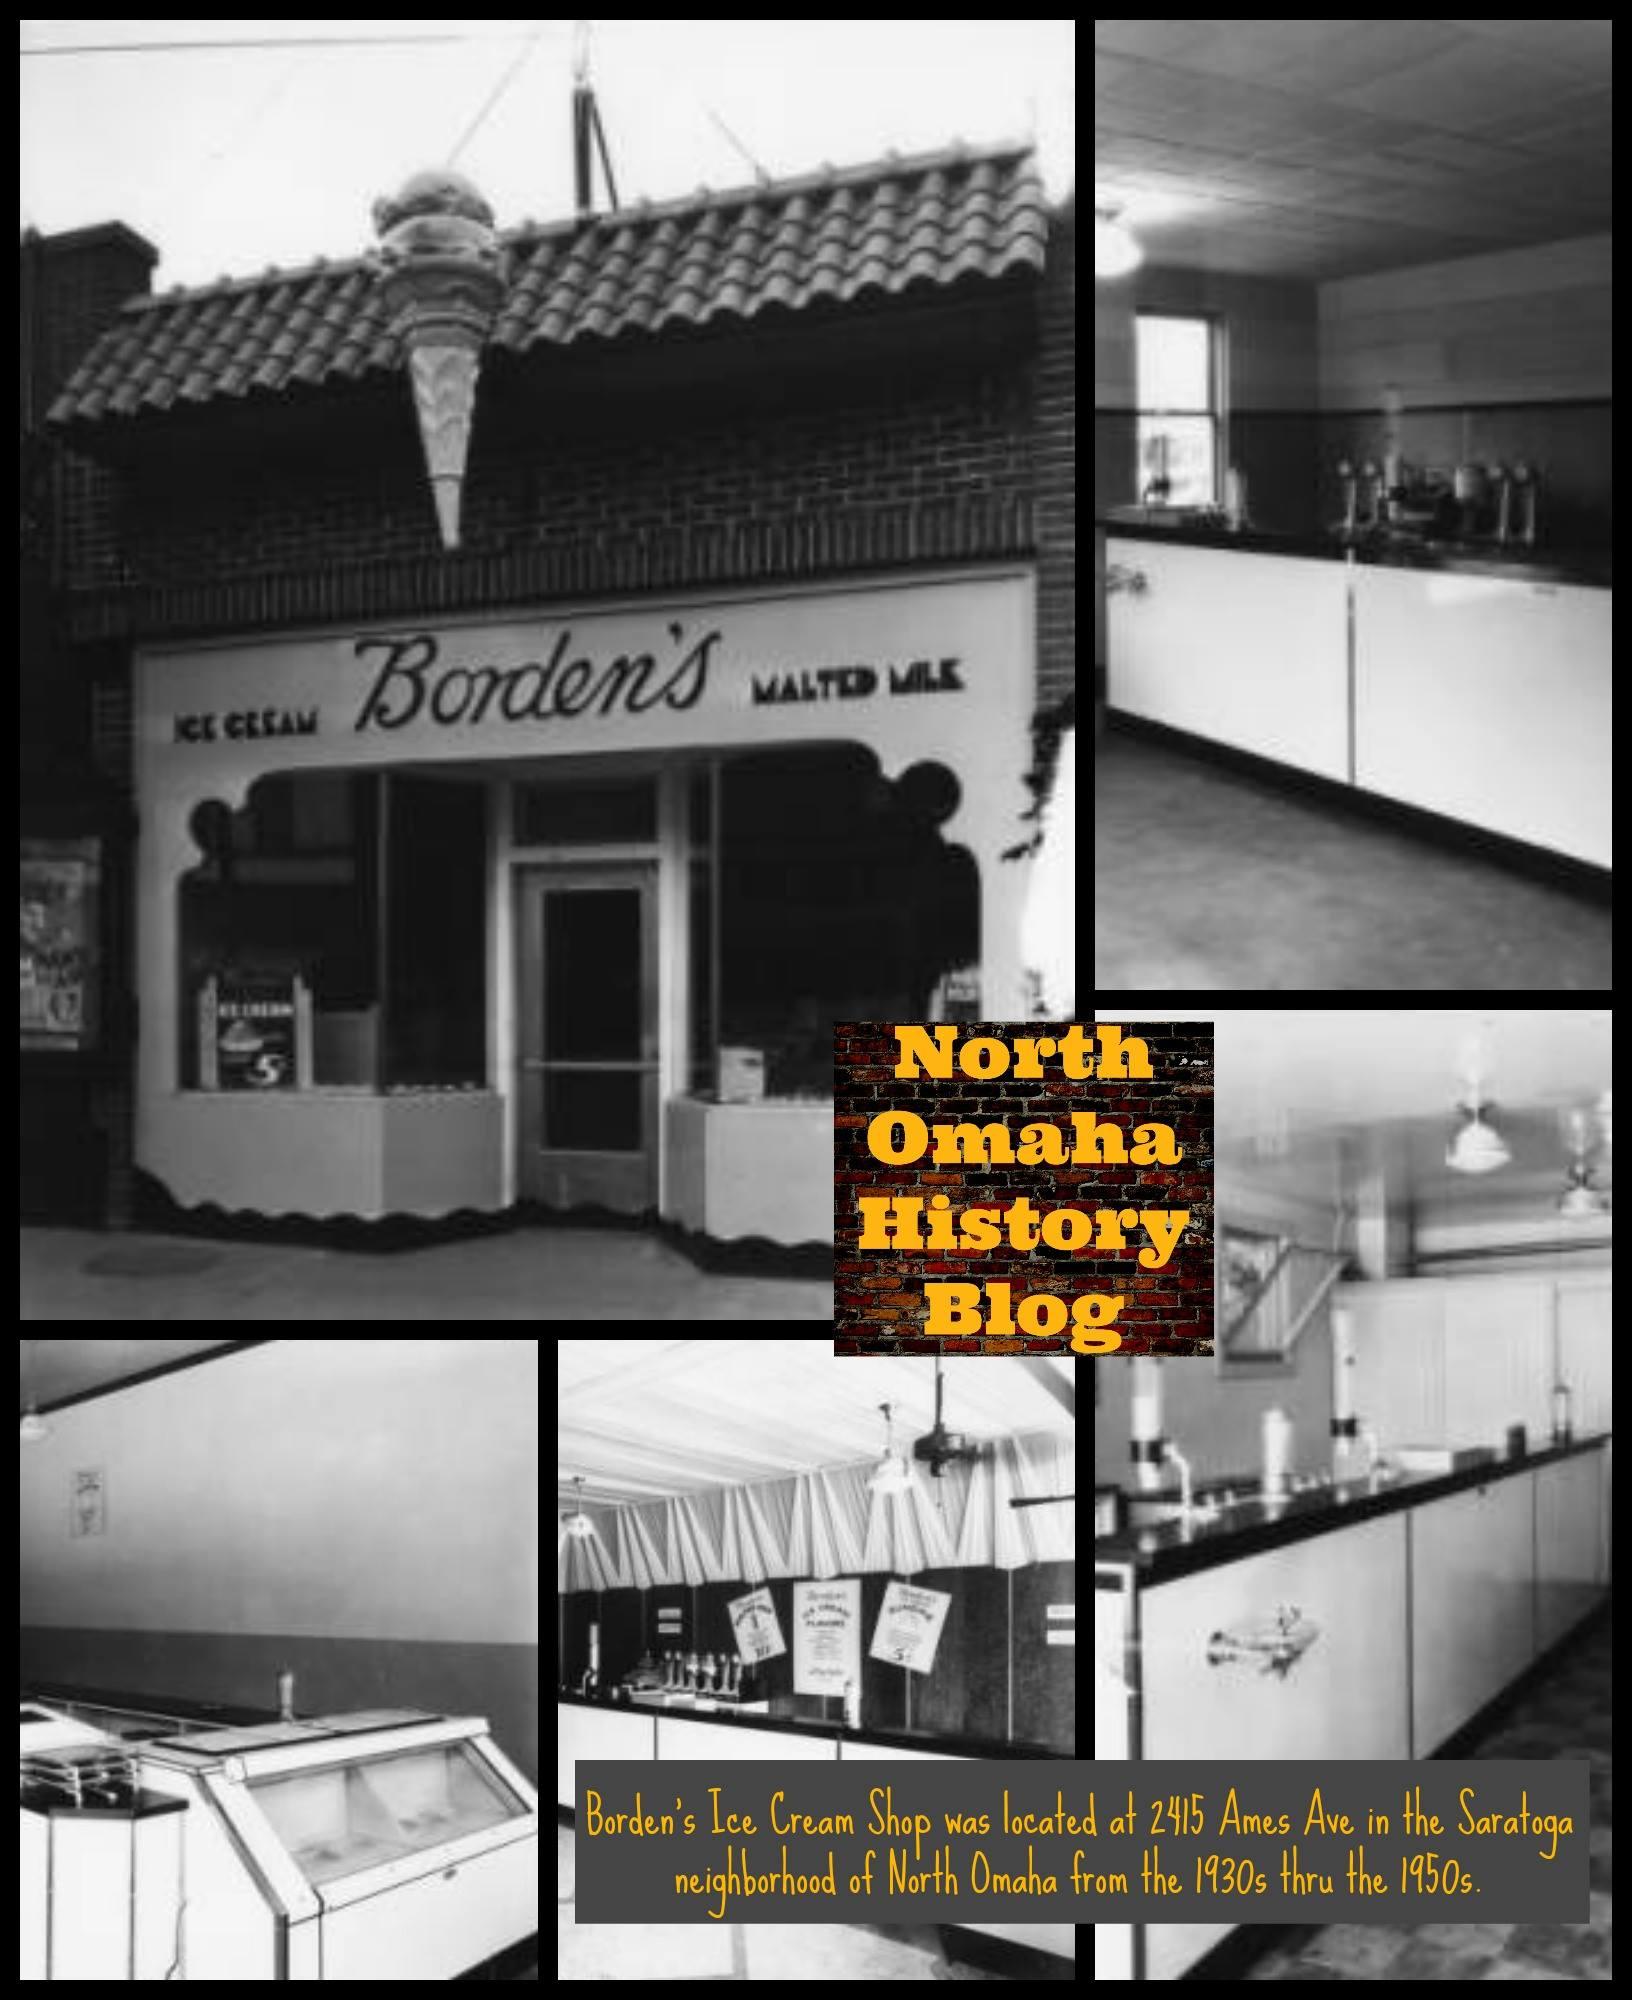 Borden's Ice Cream, 2415 Ames Avenue, North Omaha, Nebraska